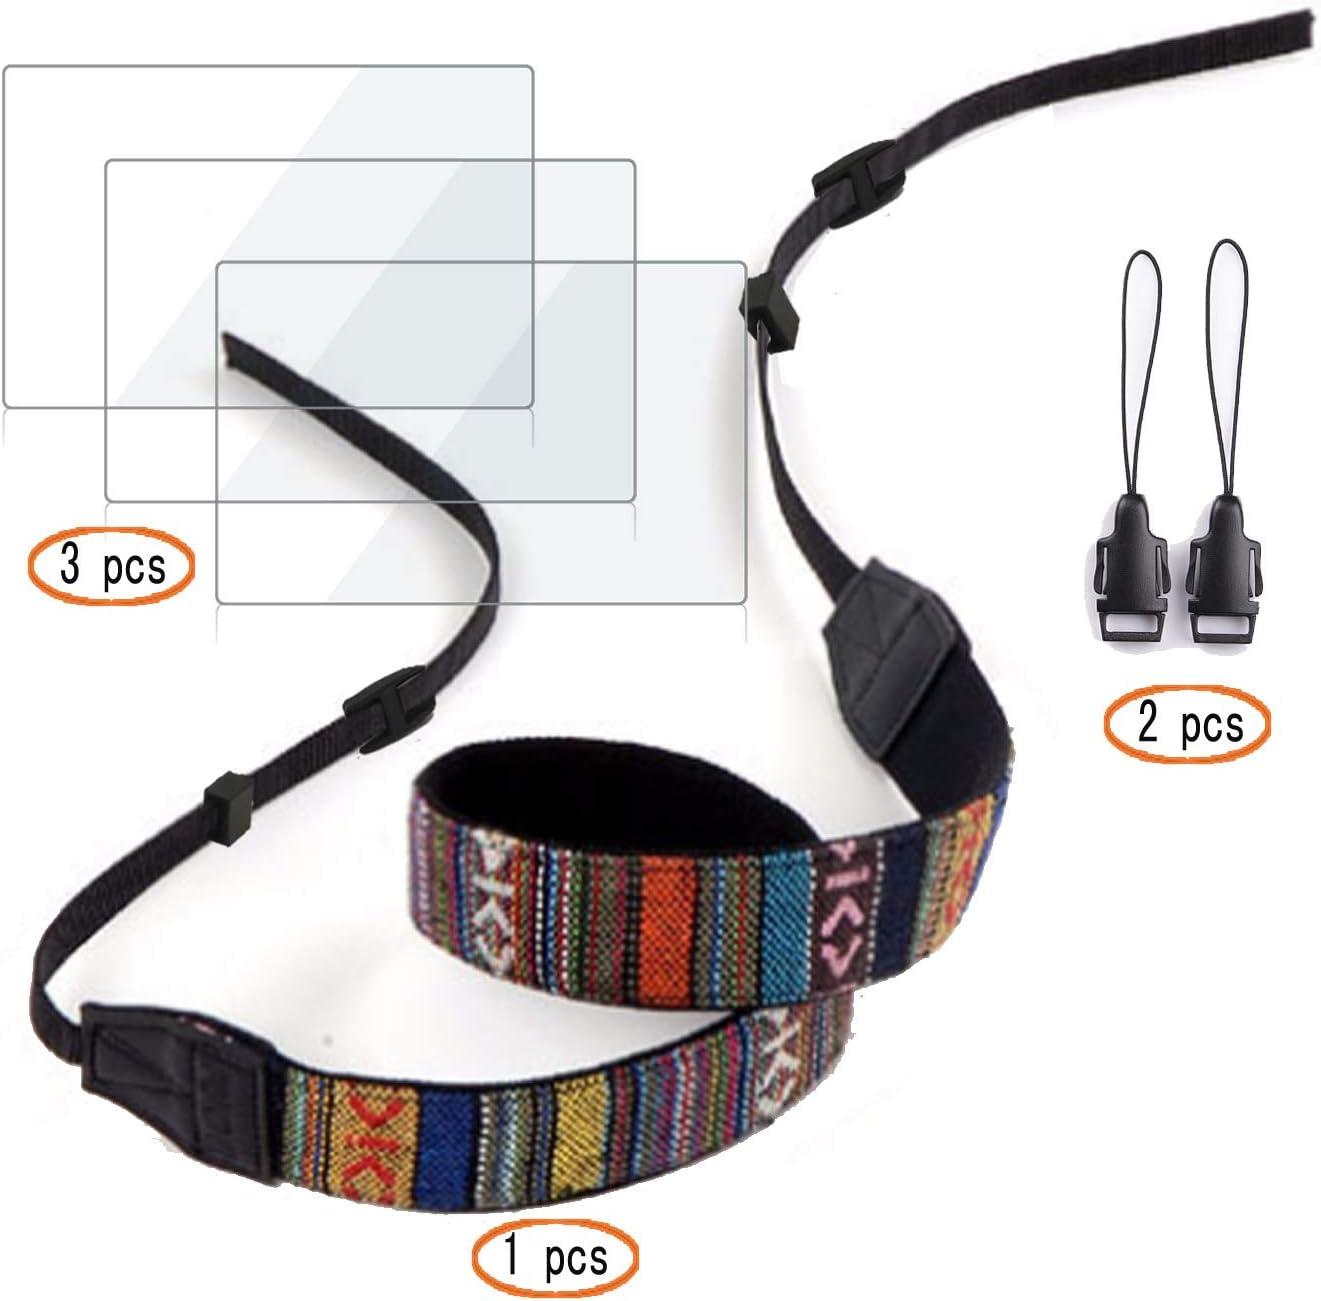 1 Pack + Shoulder Strap Screen Protector for Nikon D3500 D3400 D3300 D3200 D3100,Hard Tempered Glass 3 Pack 2 Pack +Adapter